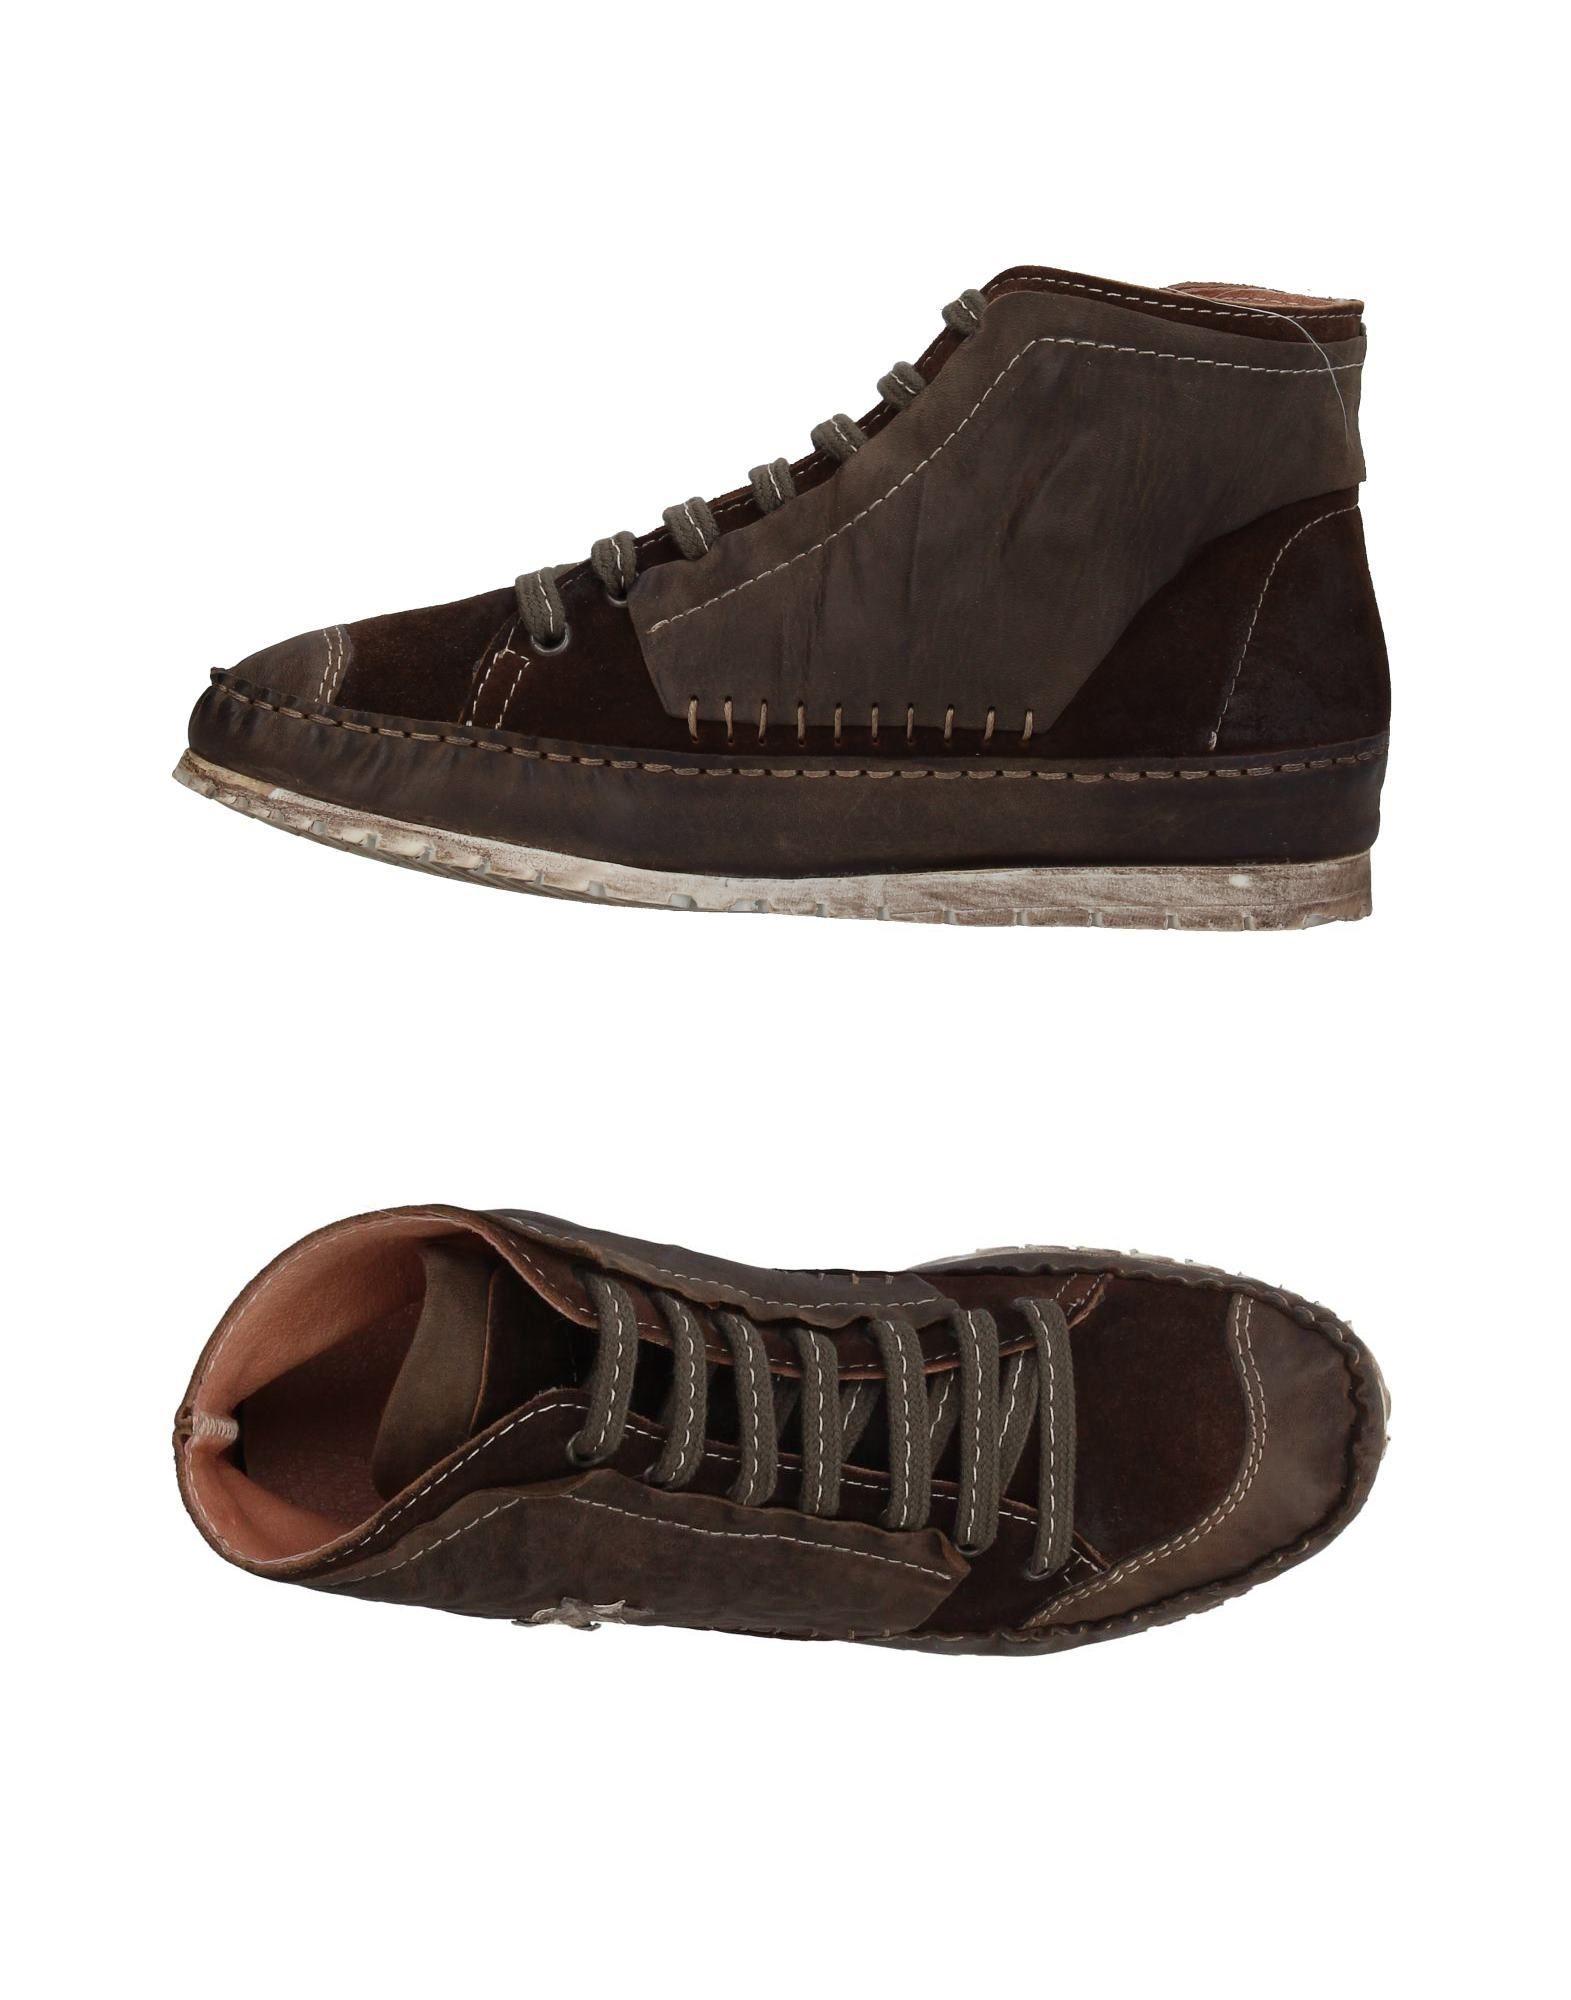 CLOCHARME Высокие кеды и кроссовки кеды кроссовки высокие dc council mid tx stone camo